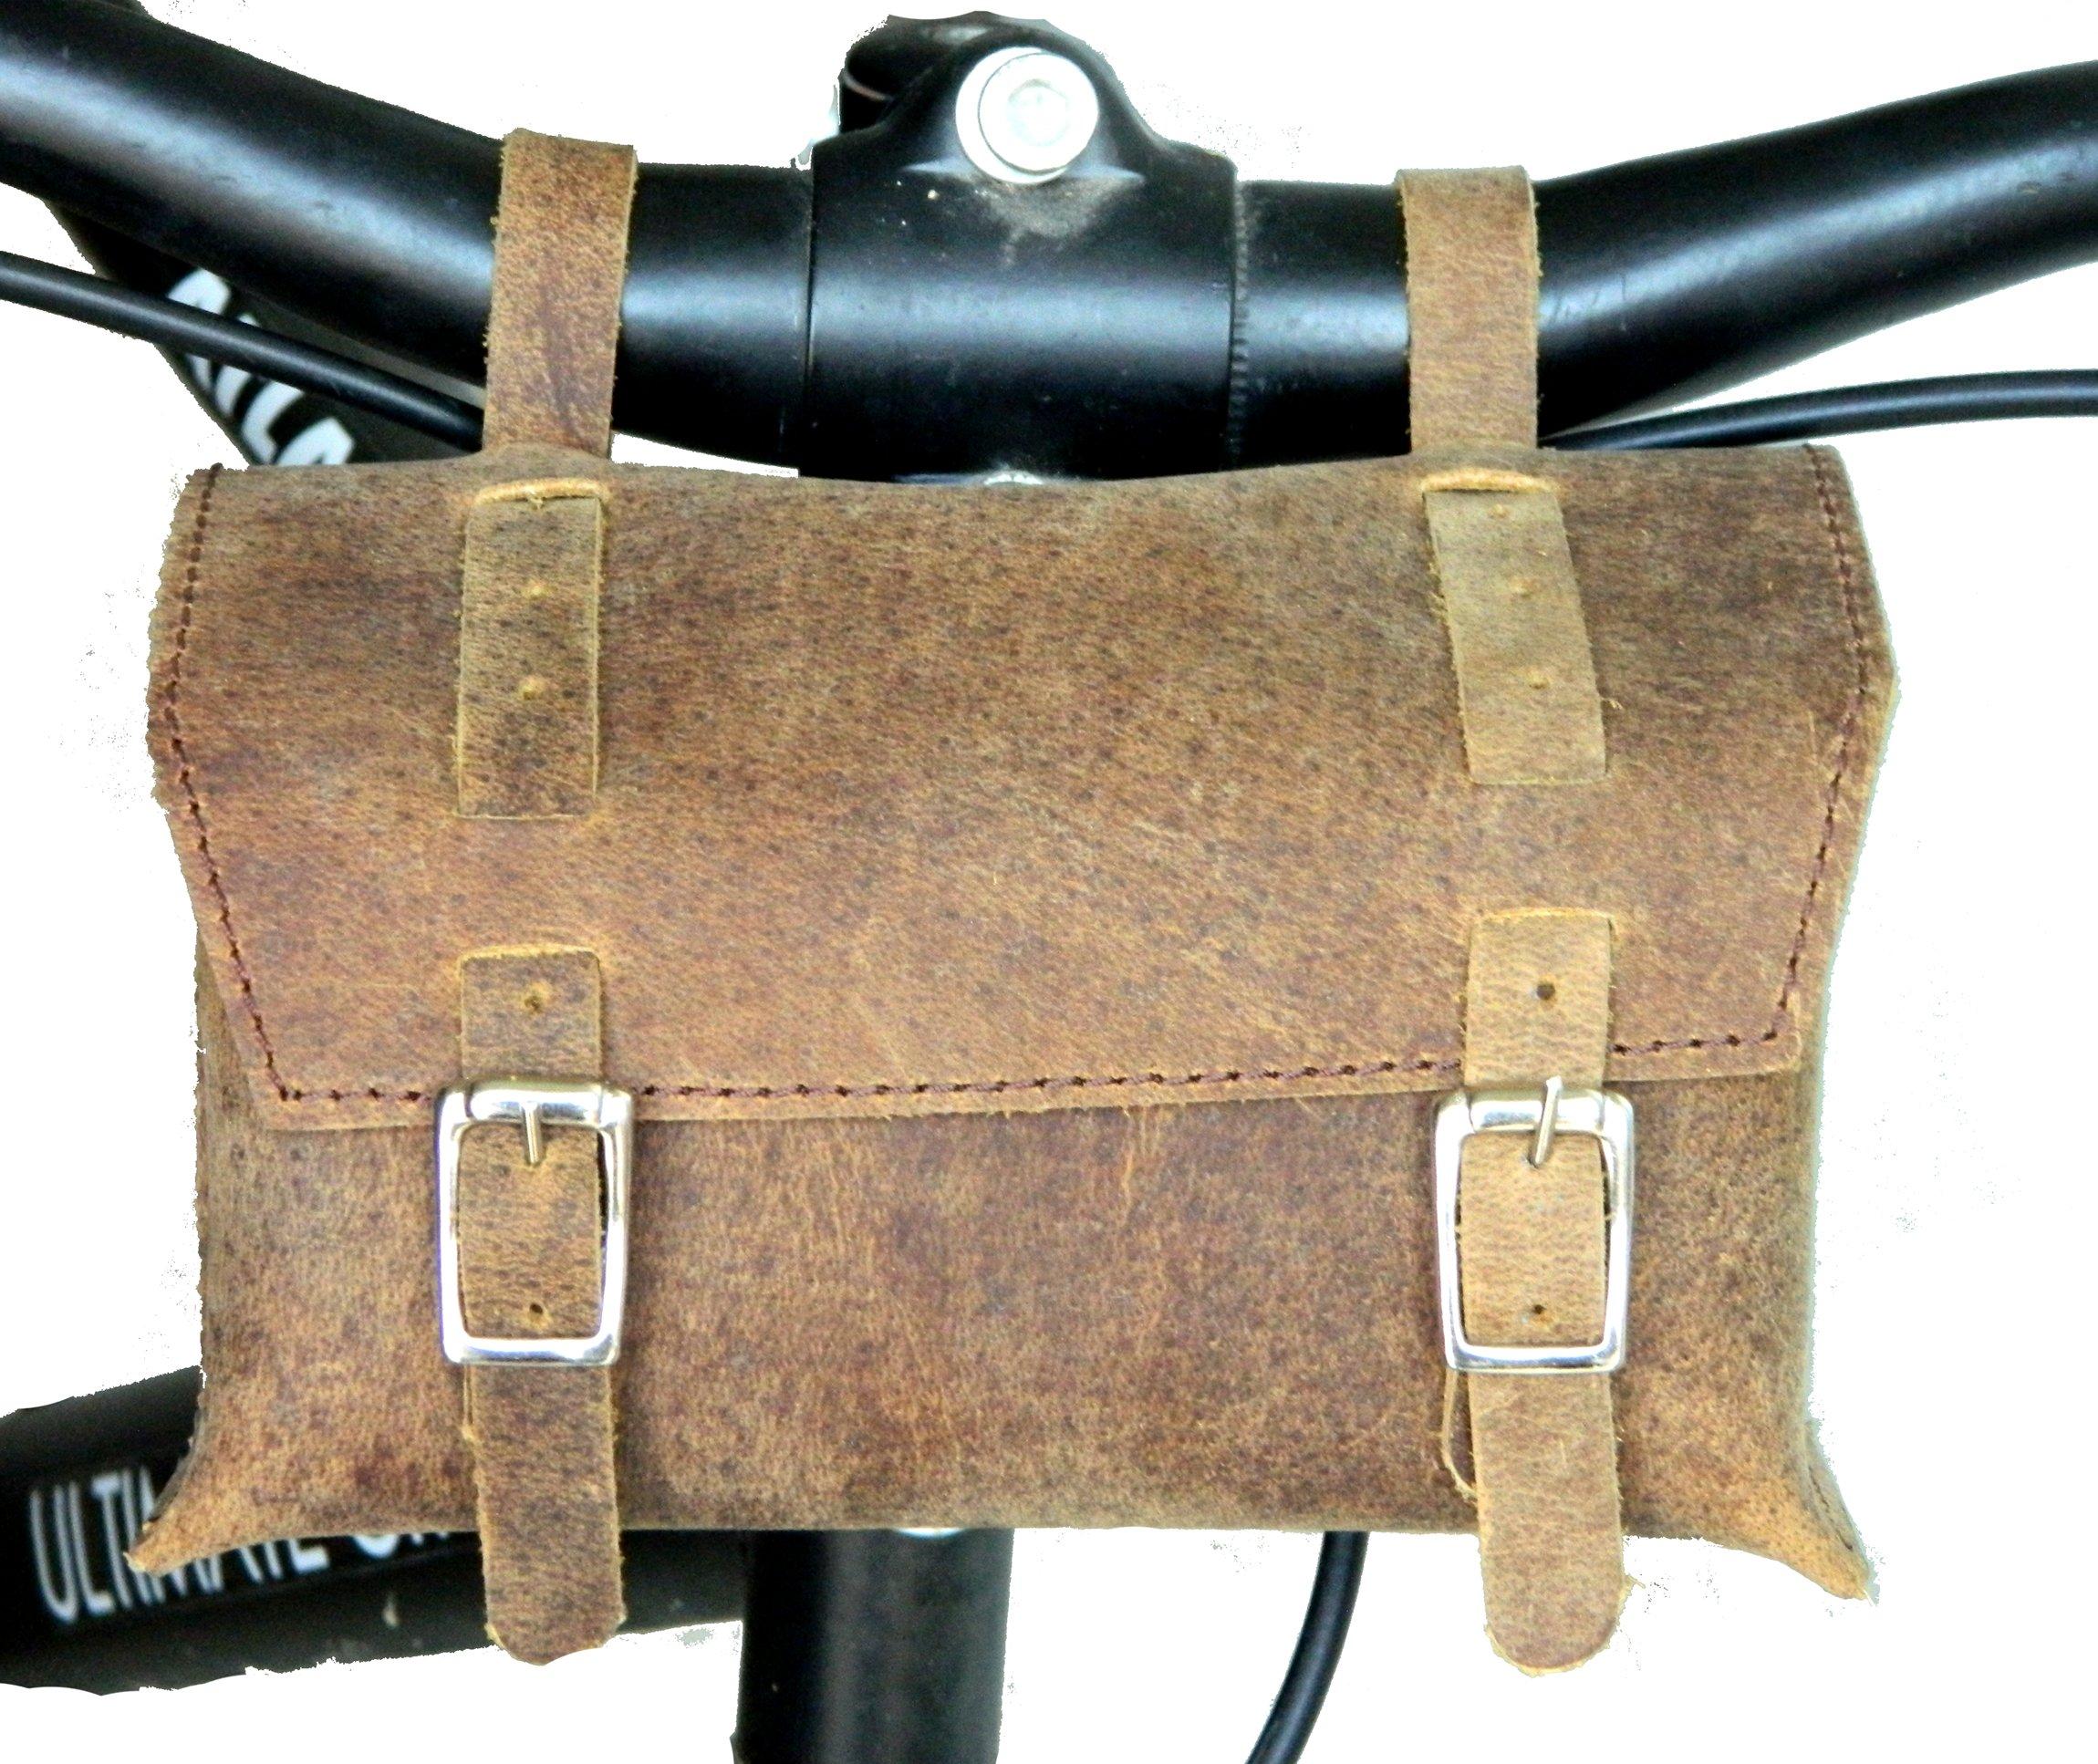 Herte Genuine Leather Bicycle Saddle Box Bag Utility Vintage Bag br by Herte (Image #4)